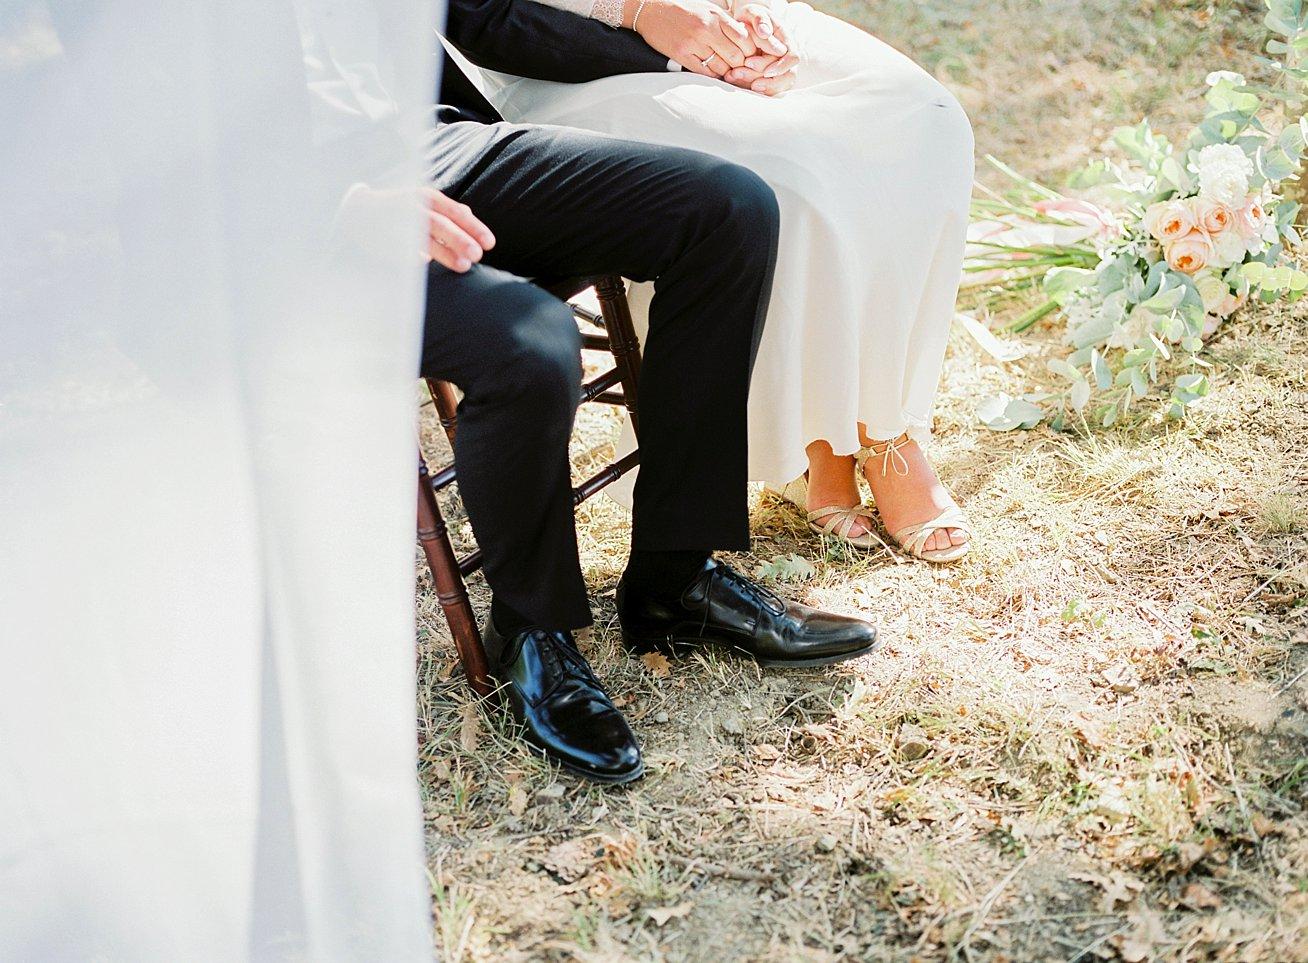 Amanda-Drost-Fotografie-Bruioft-Italie-Trouwen-buitenland-destination-wedding-italy_0045.jpg